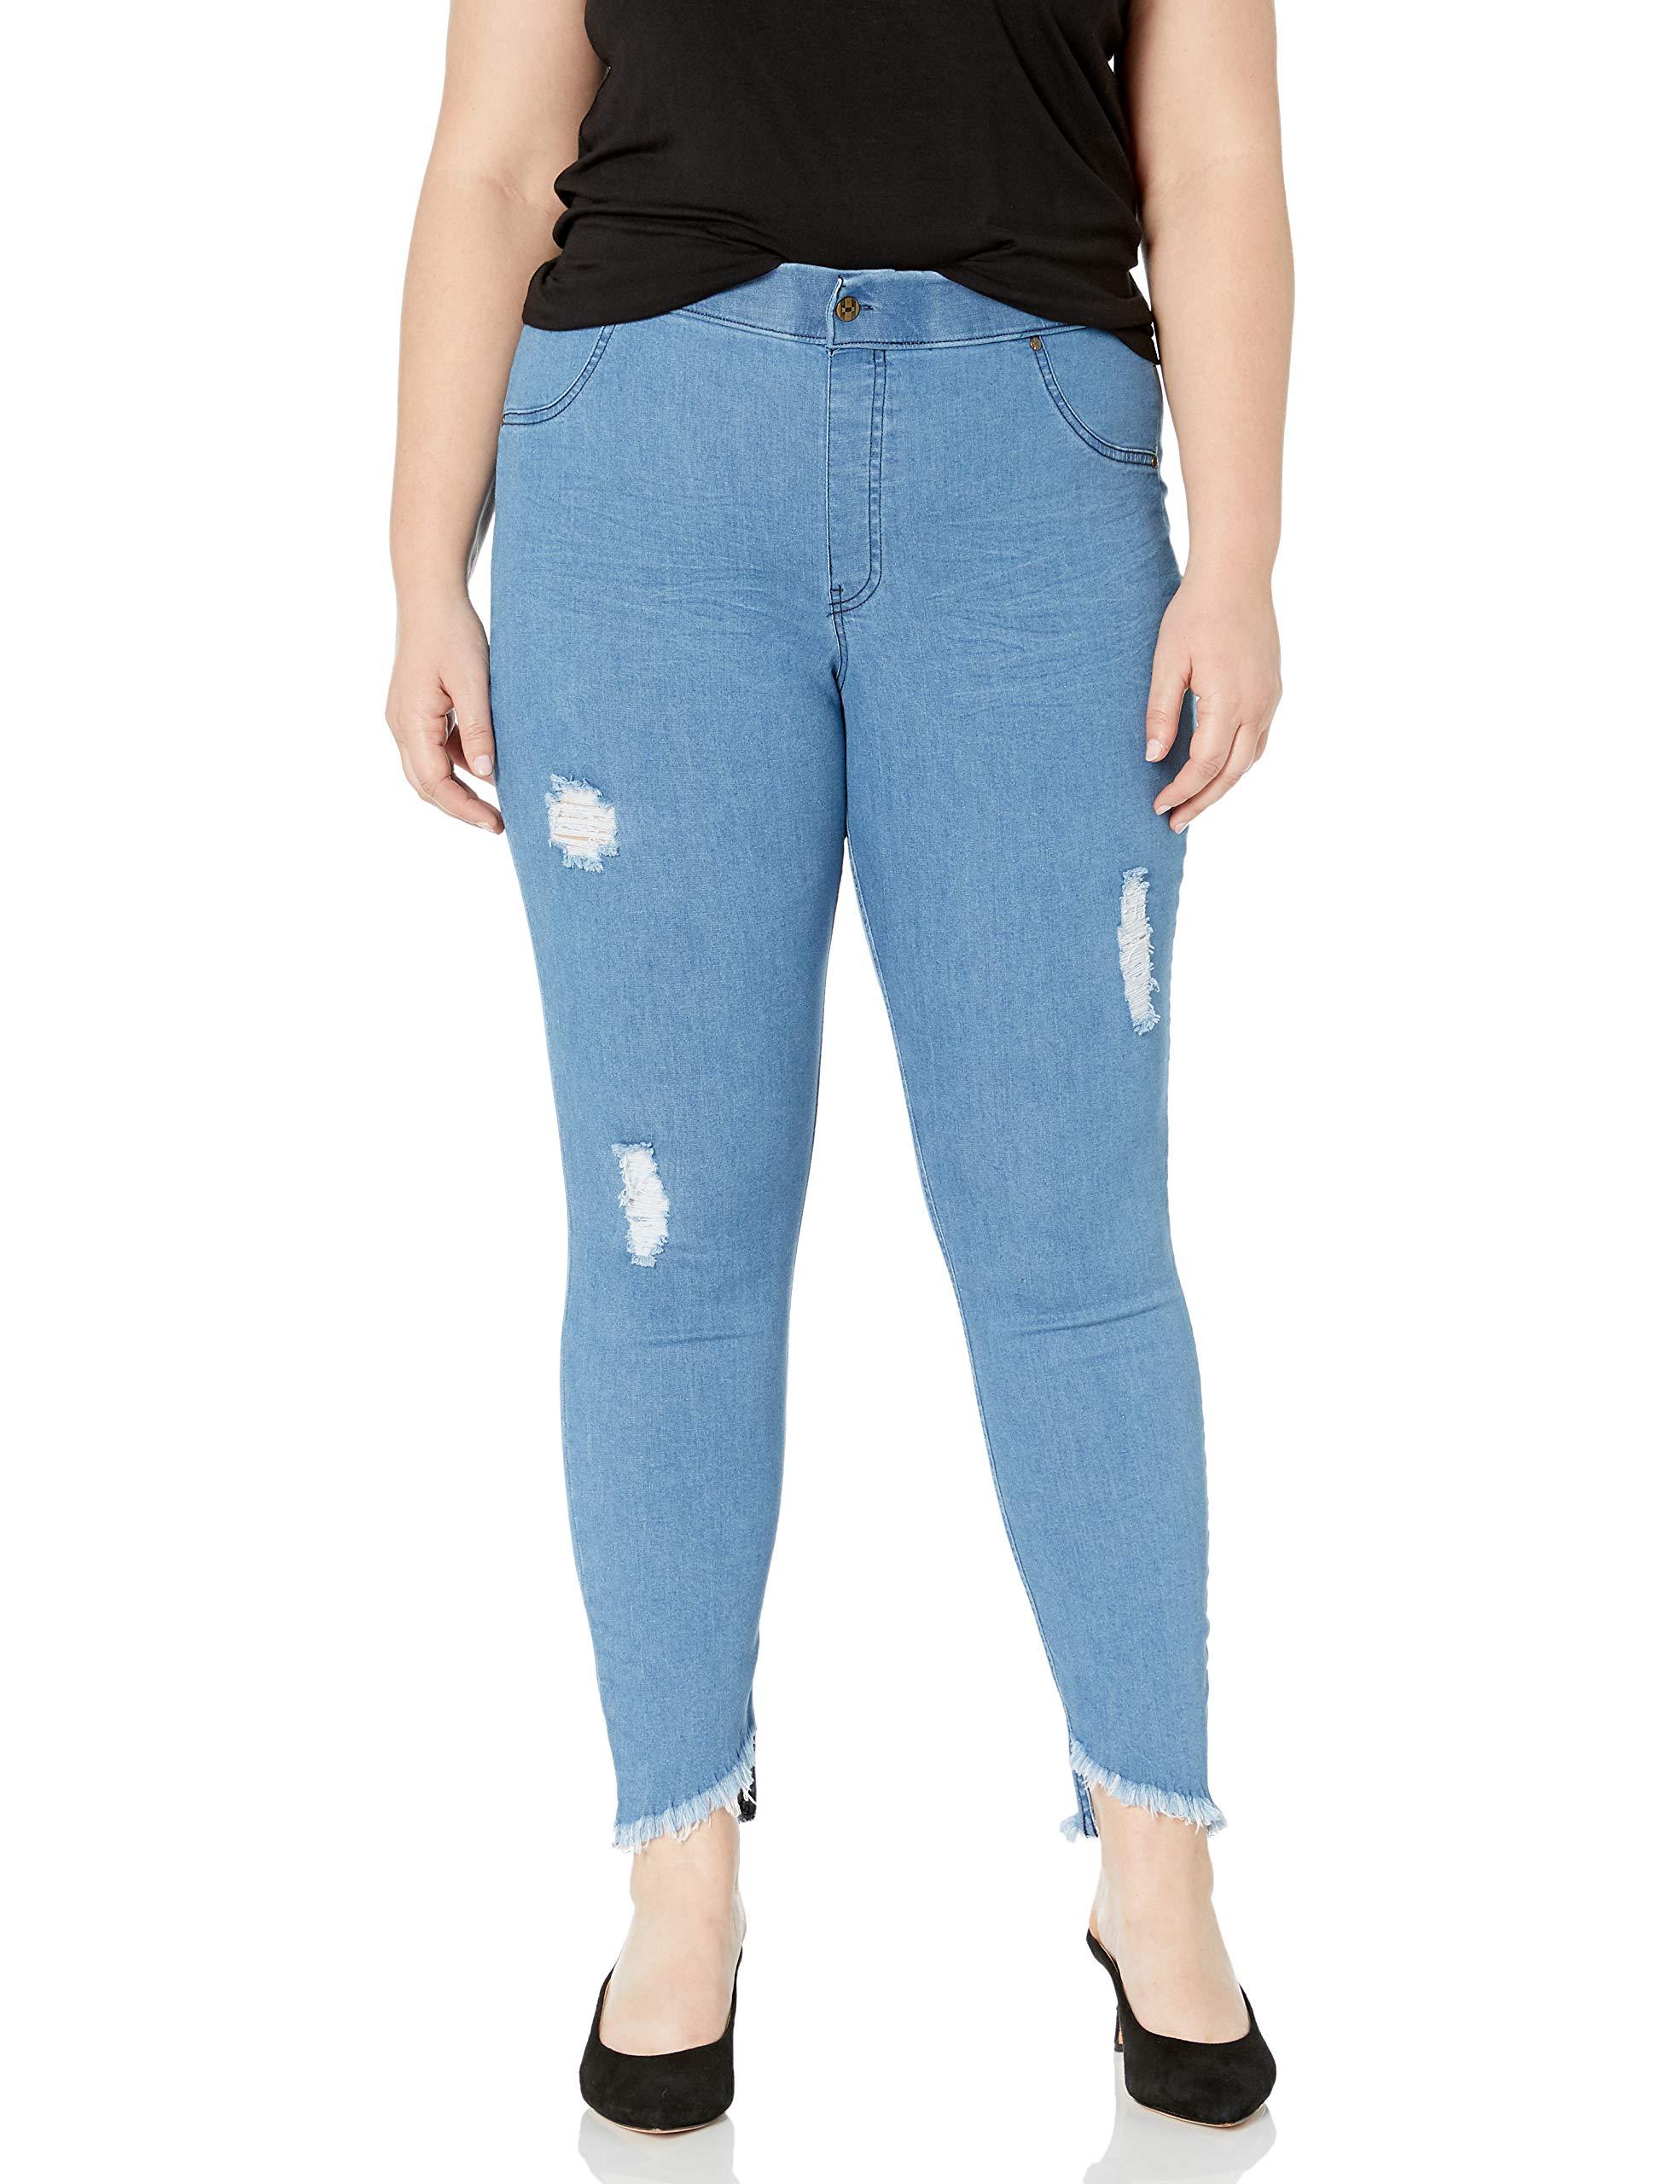 HUE Women's Plus Size Angled Hem Denim Skimmer Leggings (Stonewash - Solid, 1X) by HUE